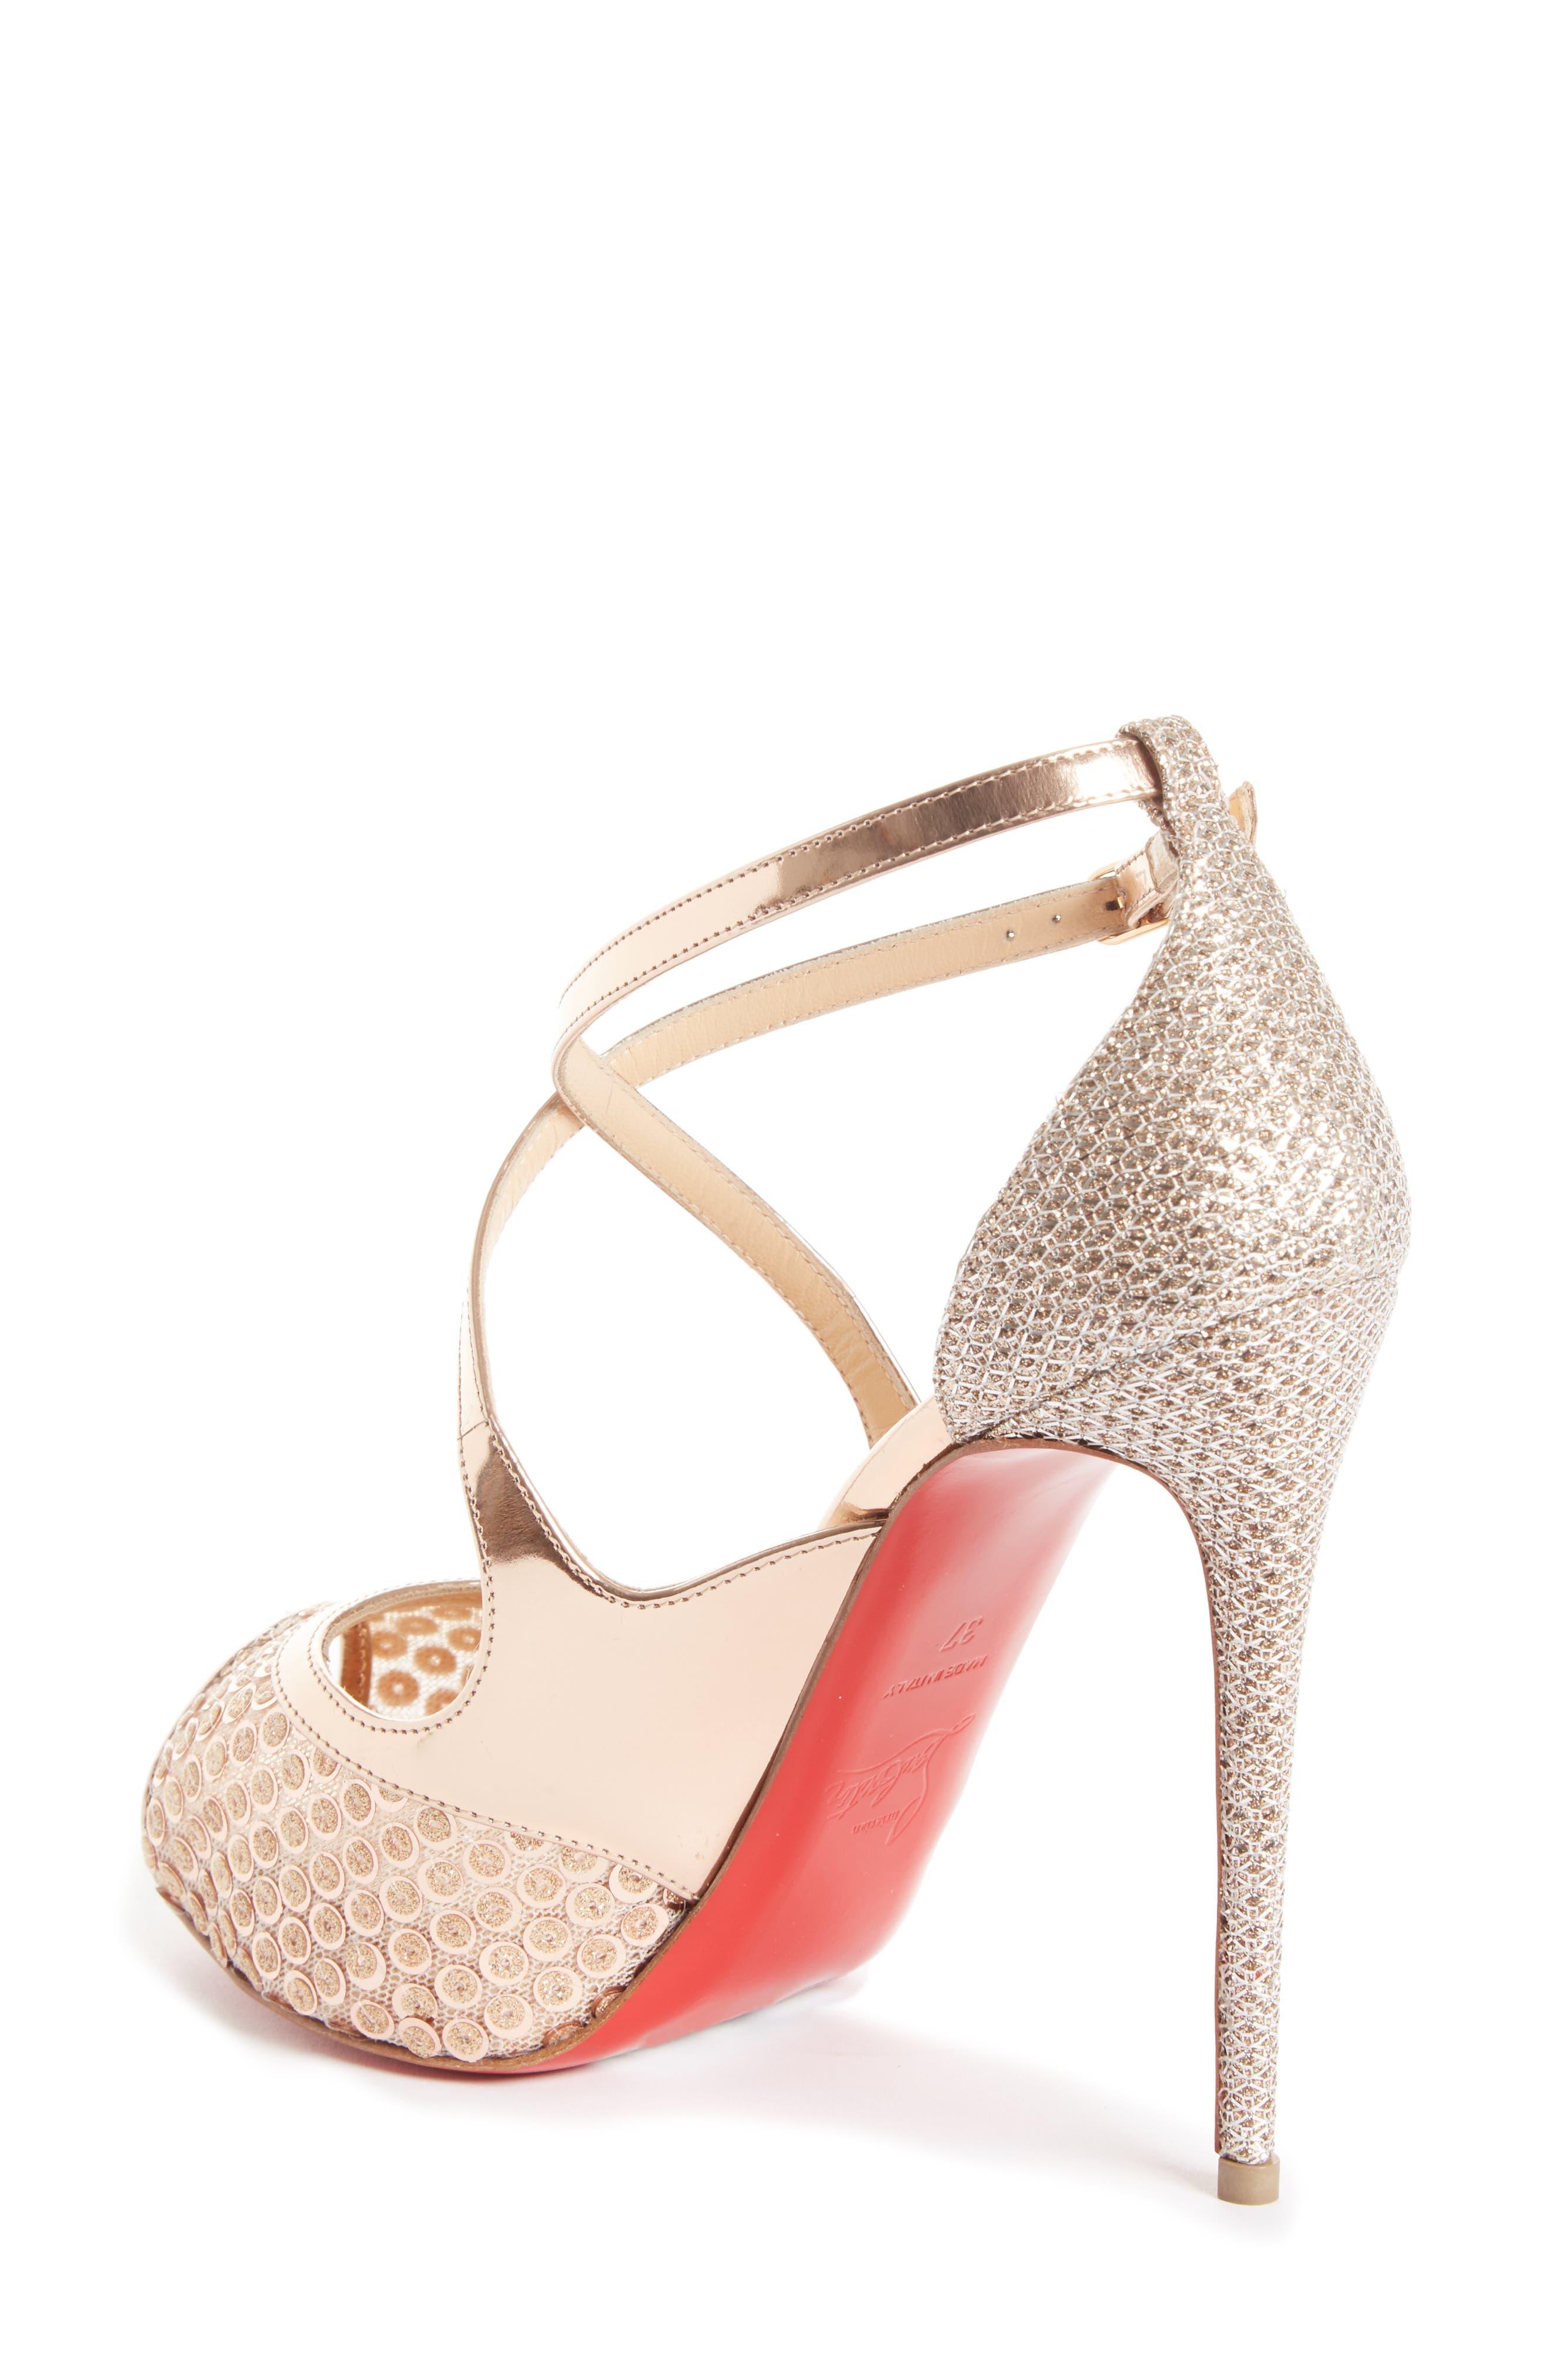 Womens Mira Bella Mesh & Specchio Leather Platform Sandals Christian Louboutin QNqgMxG